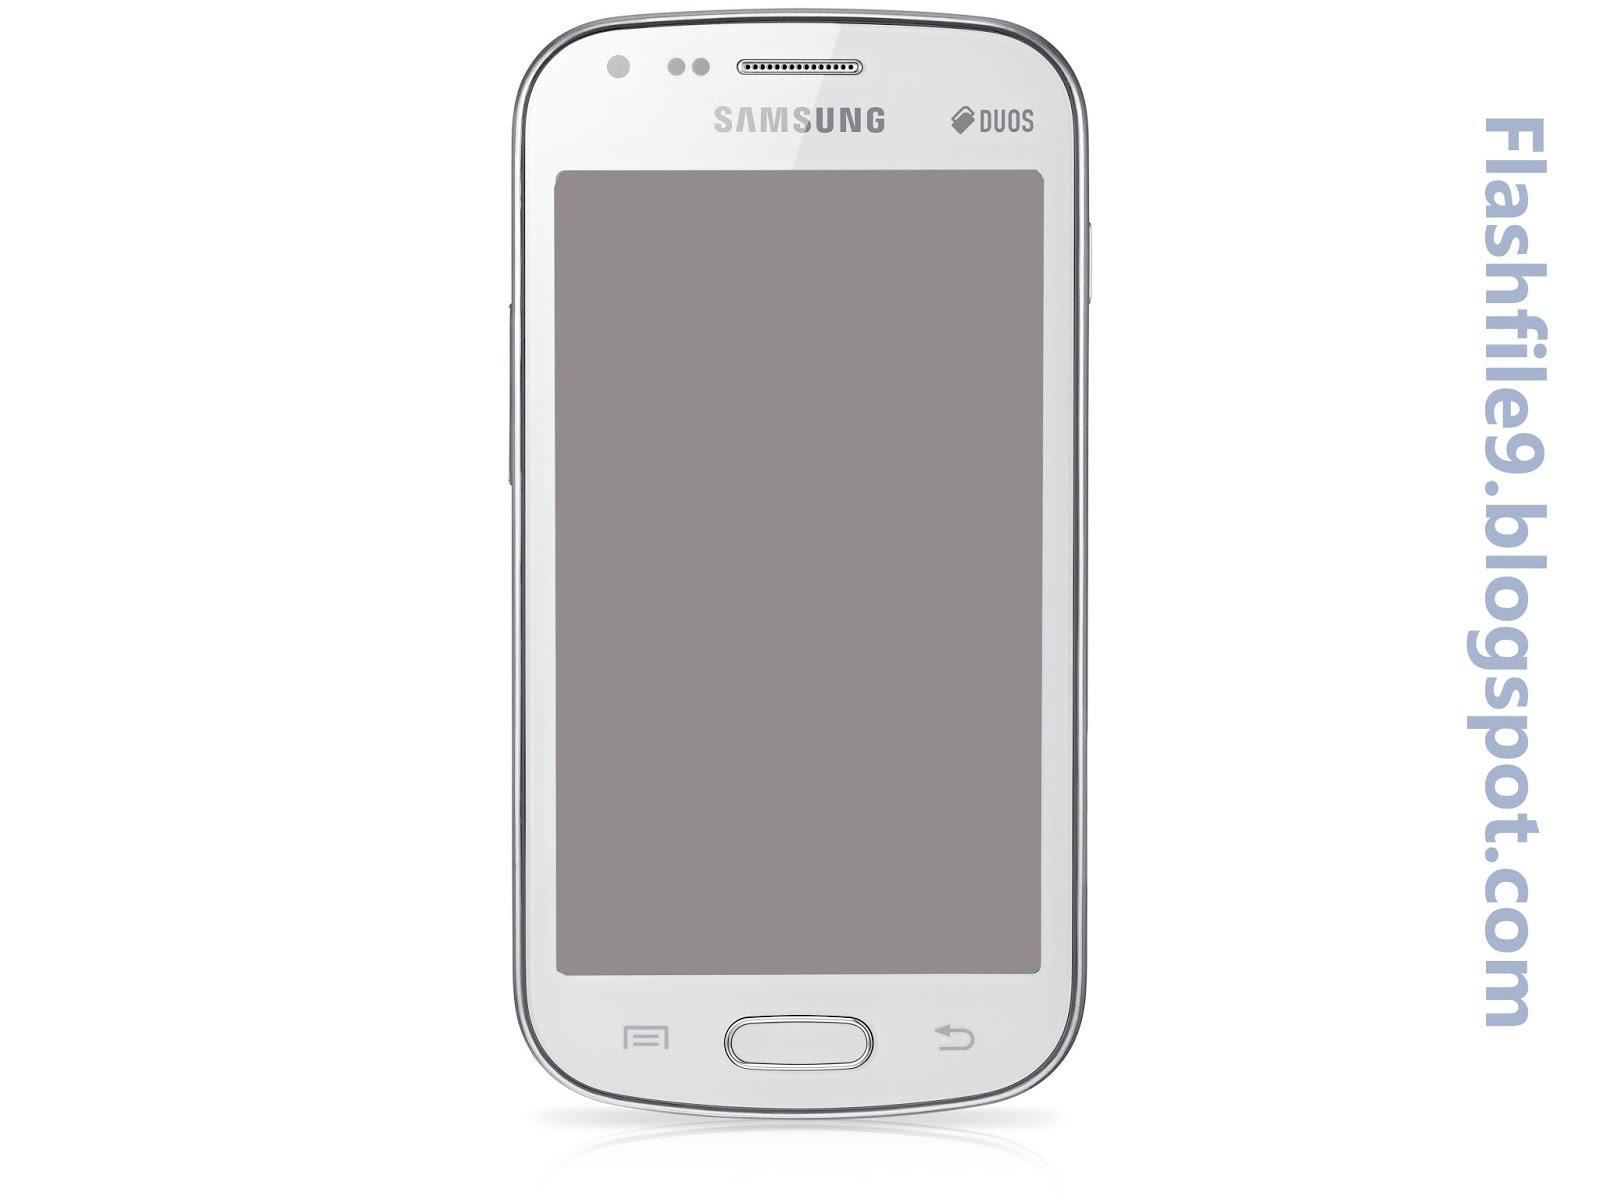 Samsung GT-S7562 Flash file MTK6572 Clone - Sp tool firmware